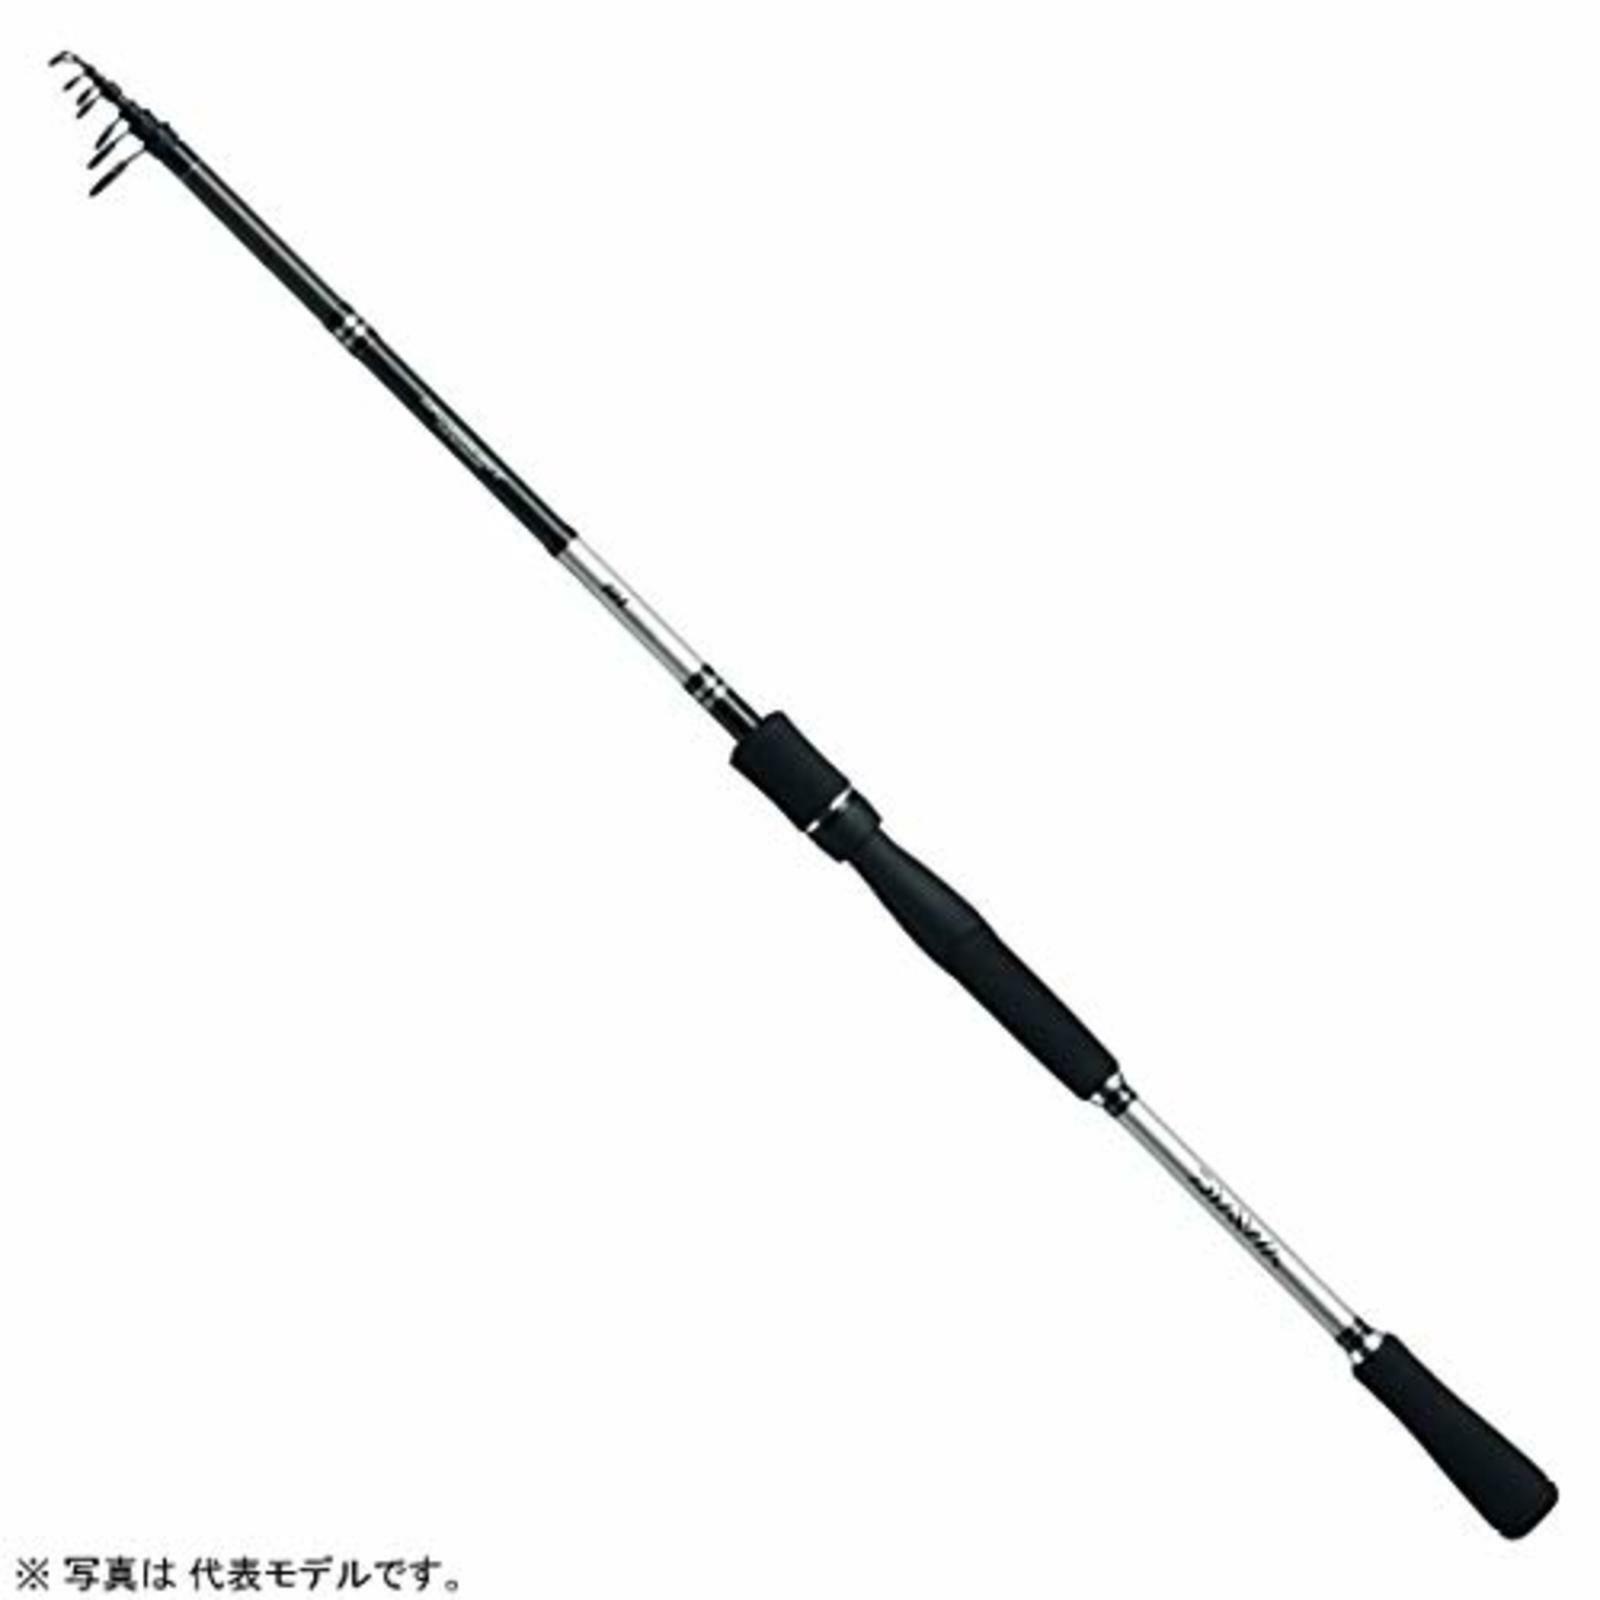 Daiwa Caña Crossbeat 965tmfs Spinning Pesca de Agua Salada Frontal   S W